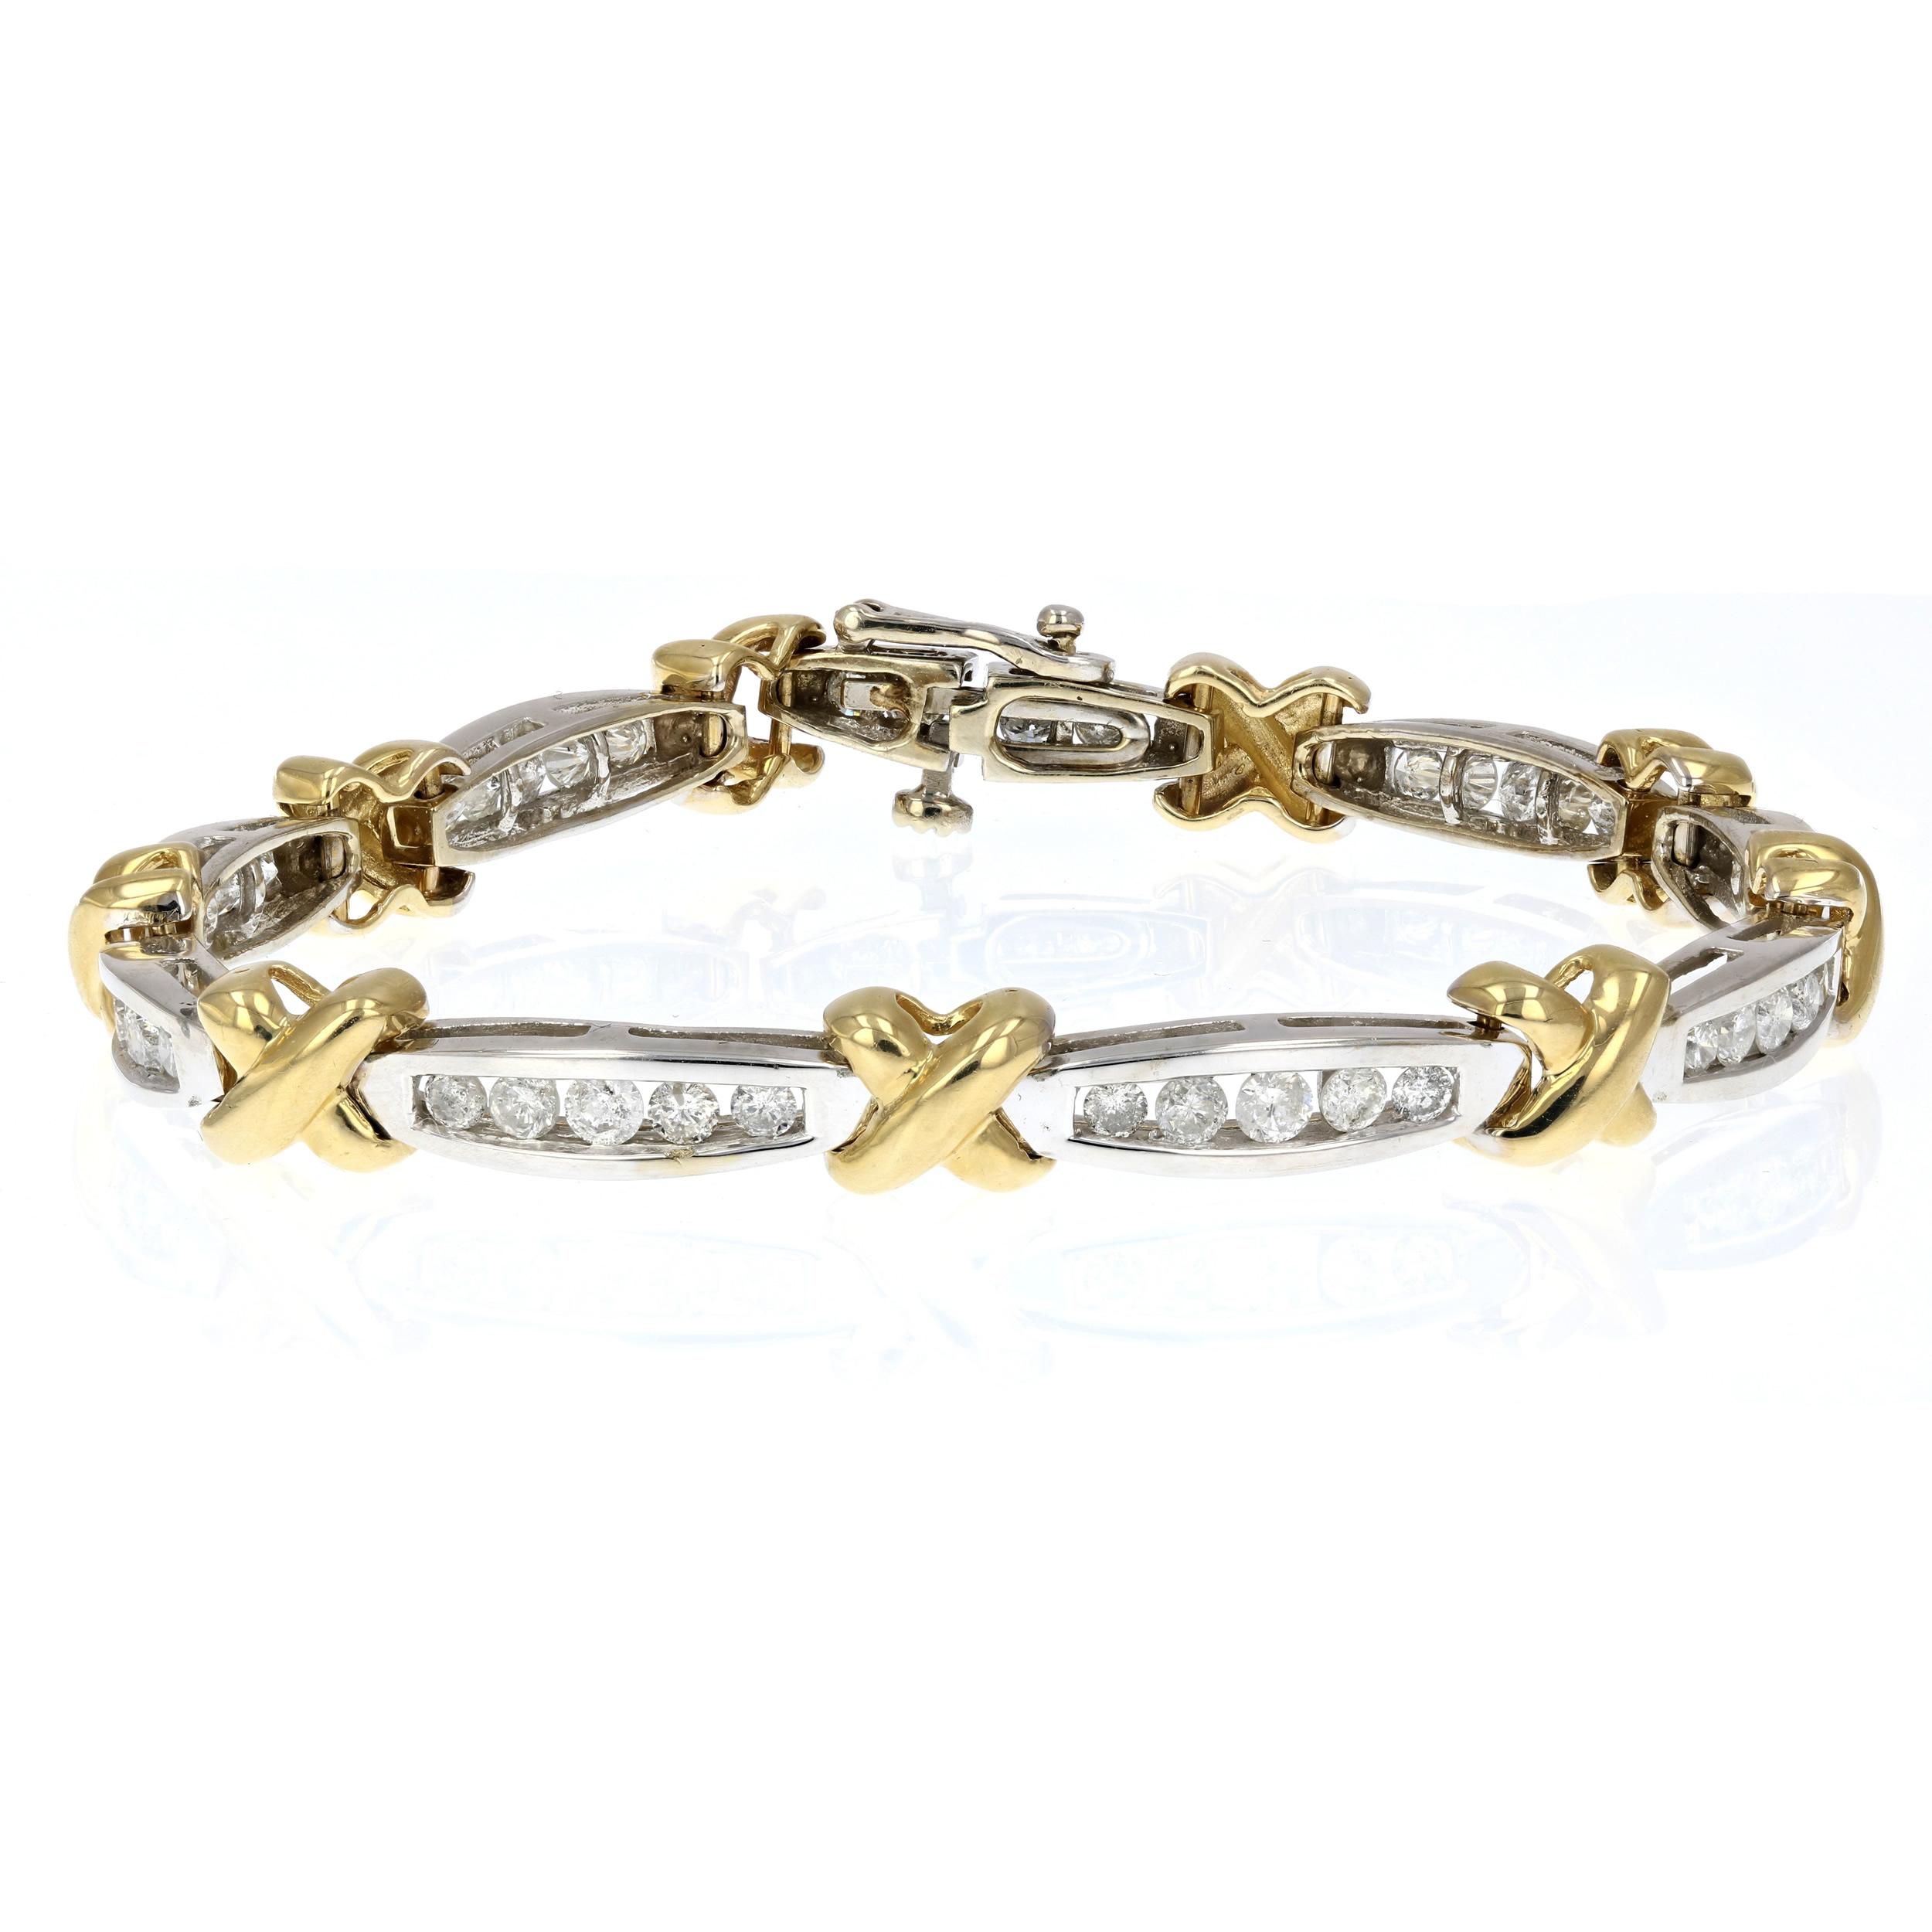 2 CT Diamond Tennis Bracelet in 14K Yellow Gold | eBay